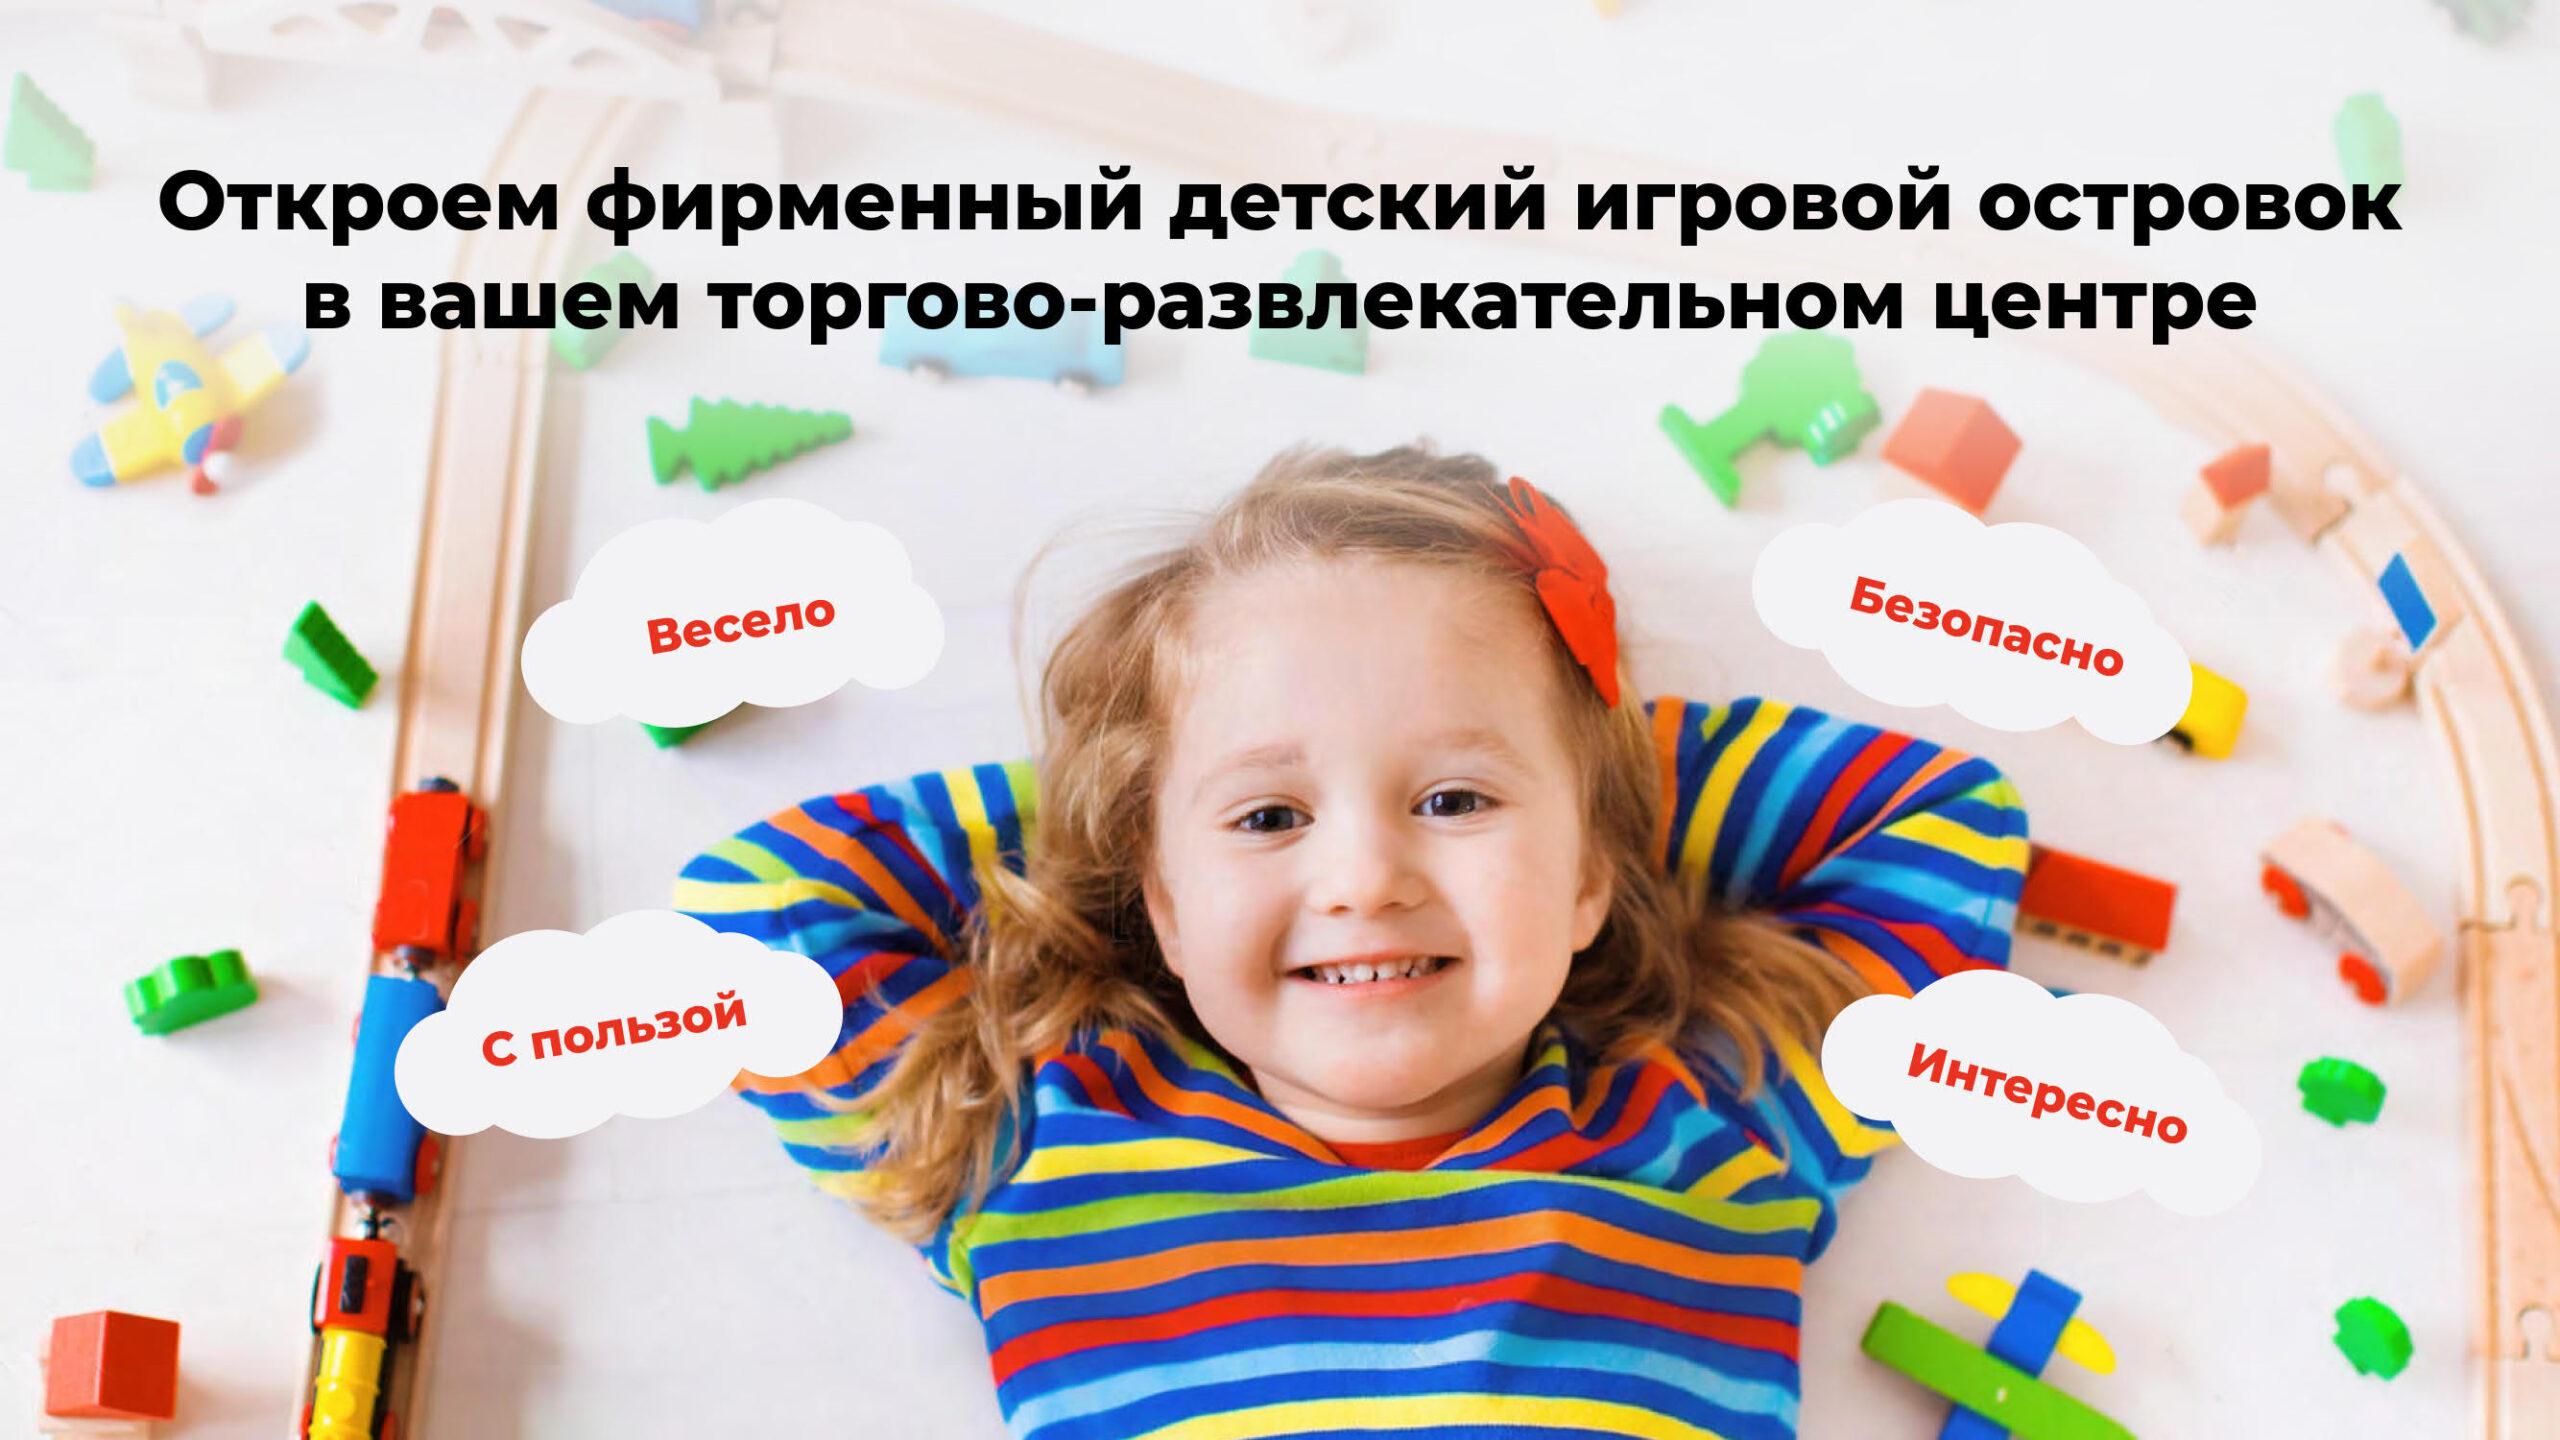 Презентация детского игрового островка «Ту-Ту Play» для ТЦ